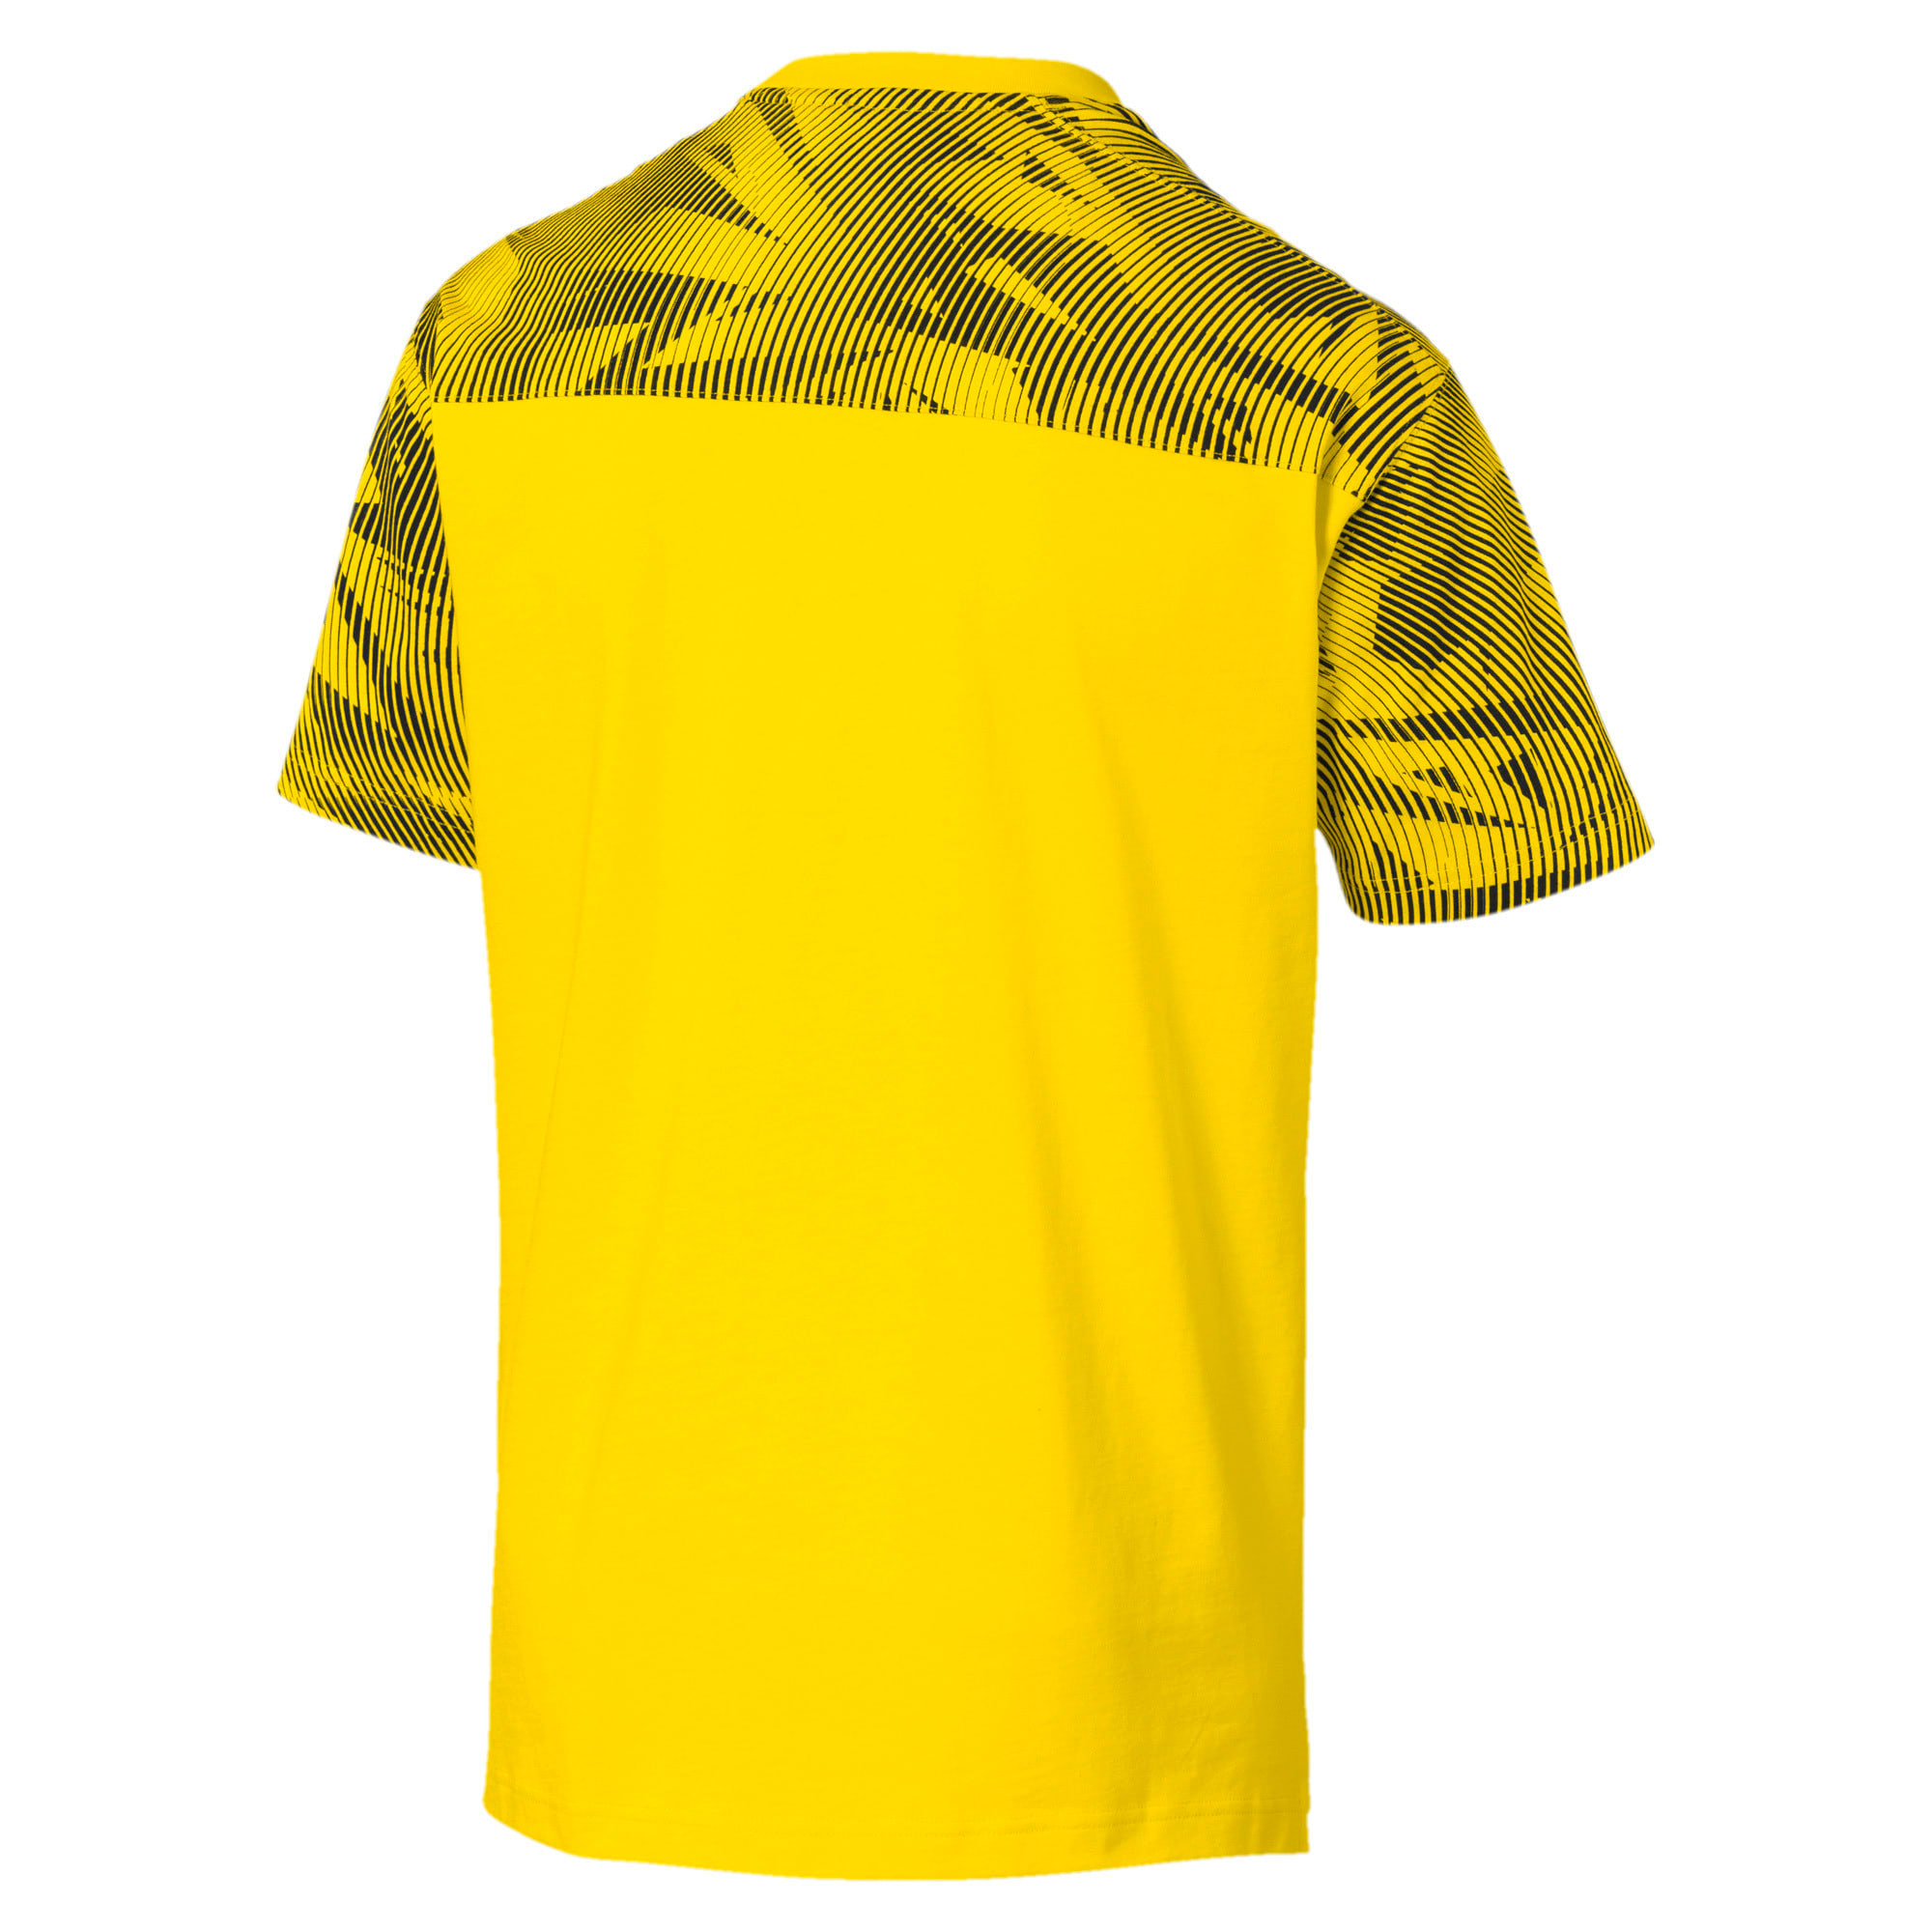 Thumbnail 5 of BVB Casuals Men's Tee, Cyber Yellow-Puma Black, medium